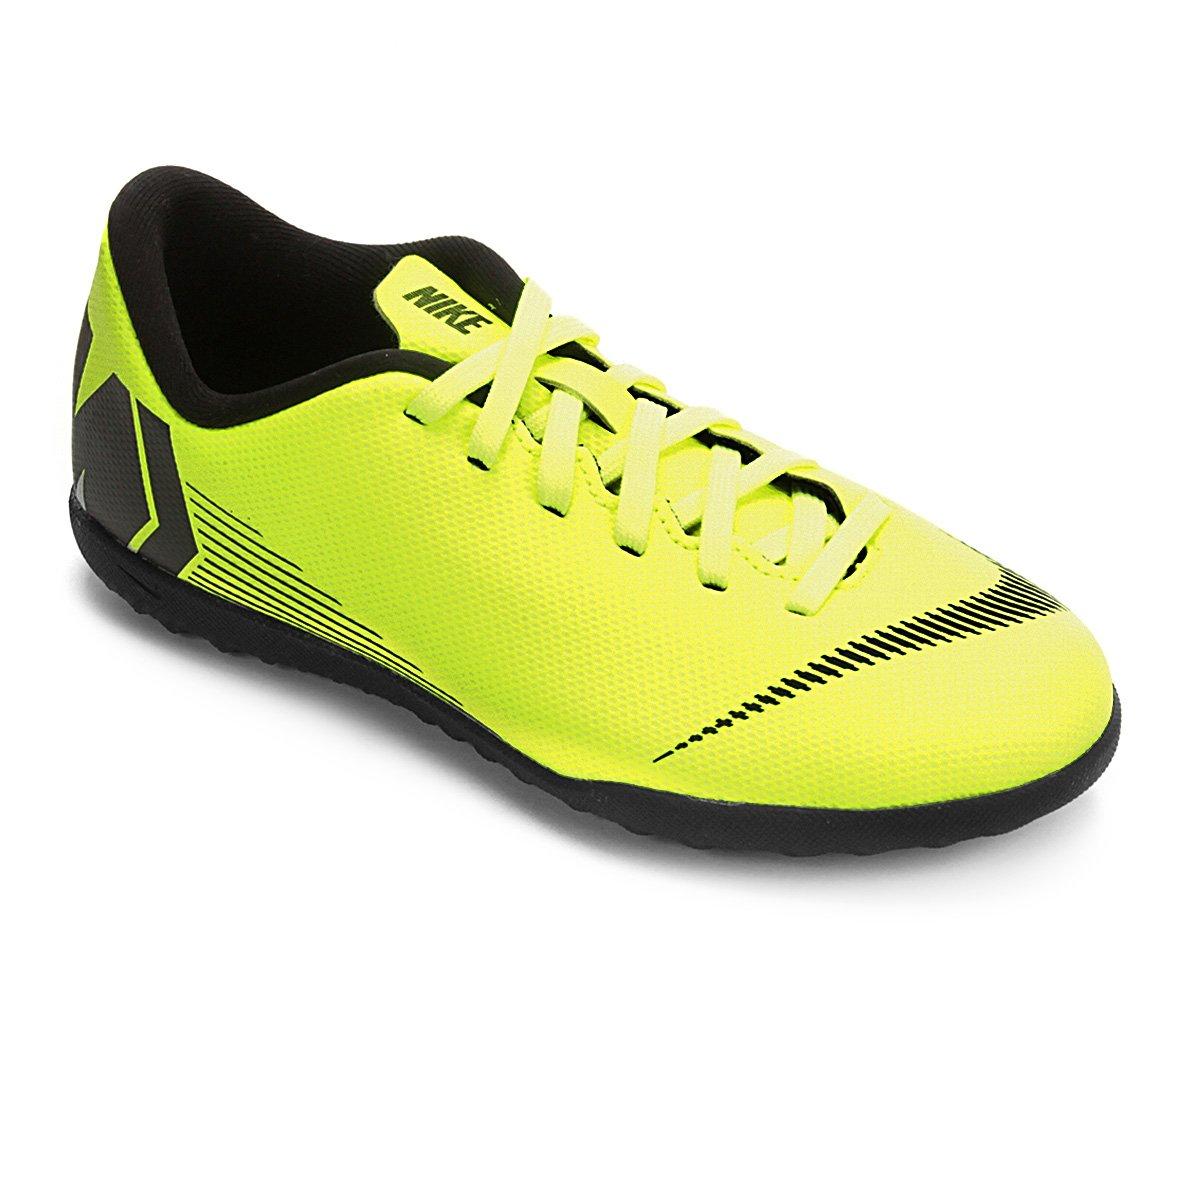 6a2817de59 Chuteira Society Infantil Nike Mercurial VaporX 12 Club GS TF ...